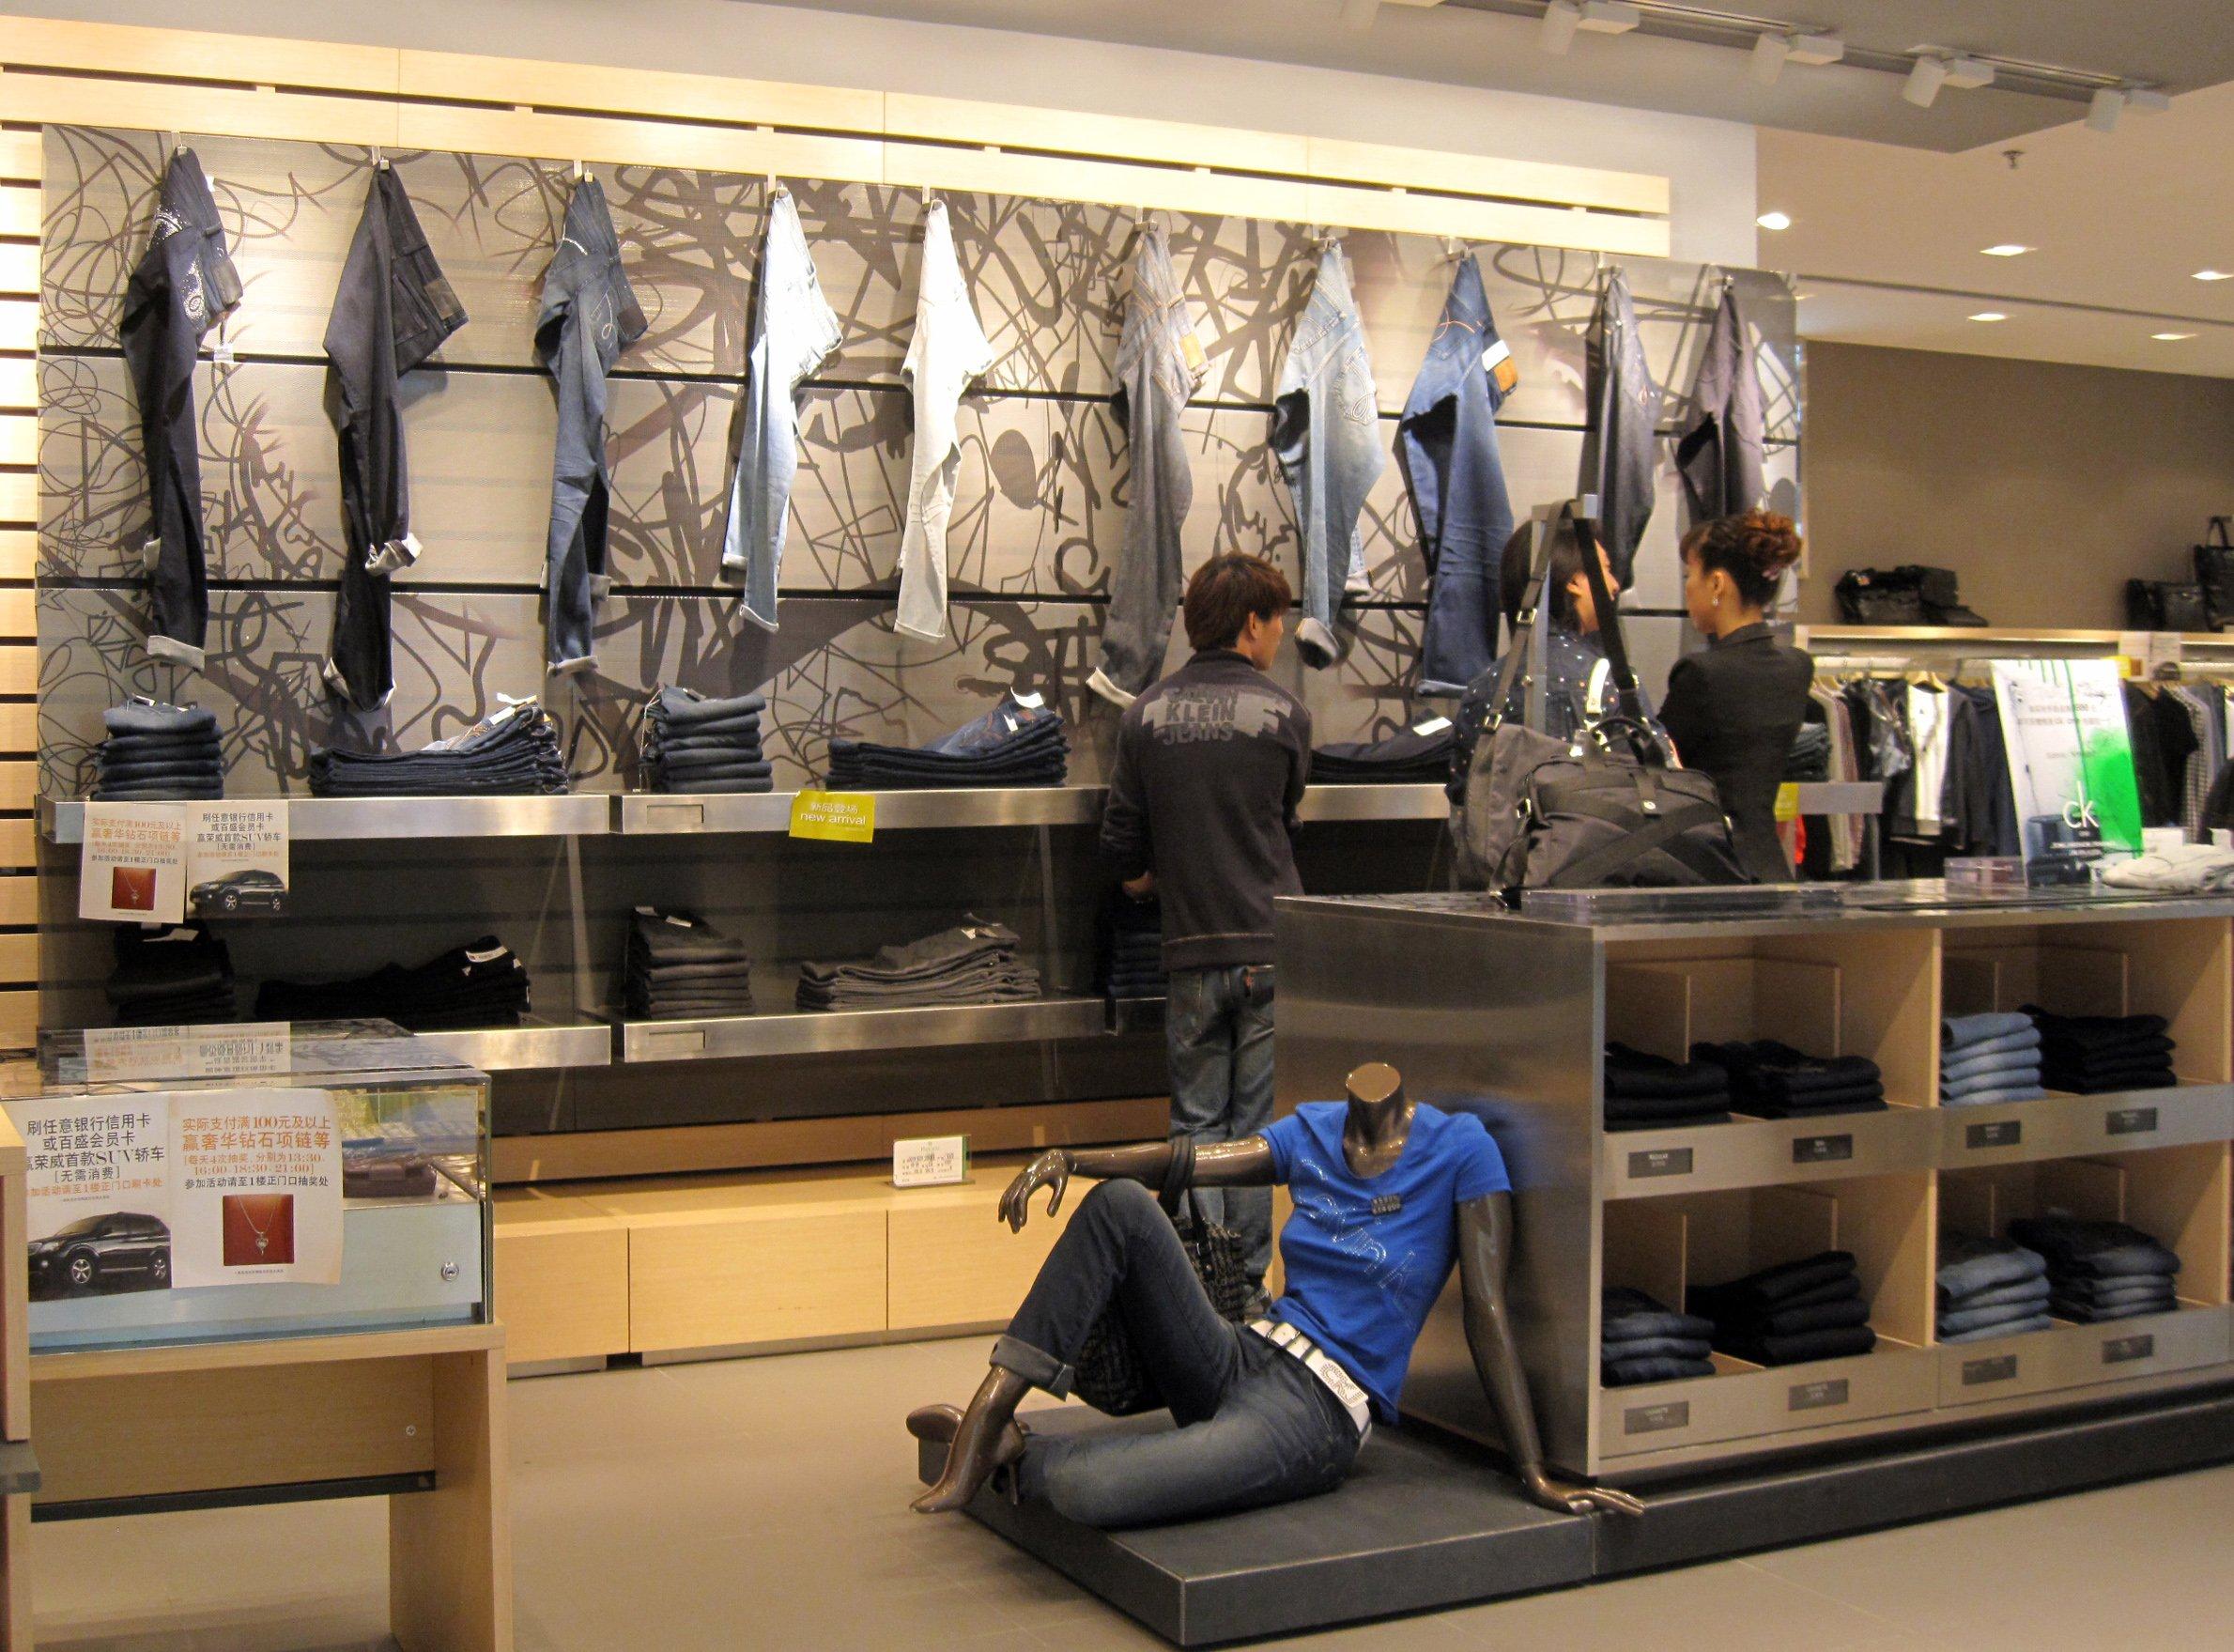 do ferrera description calvin klein jeans corner in huaihai road store images frompo. Black Bedroom Furniture Sets. Home Design Ideas